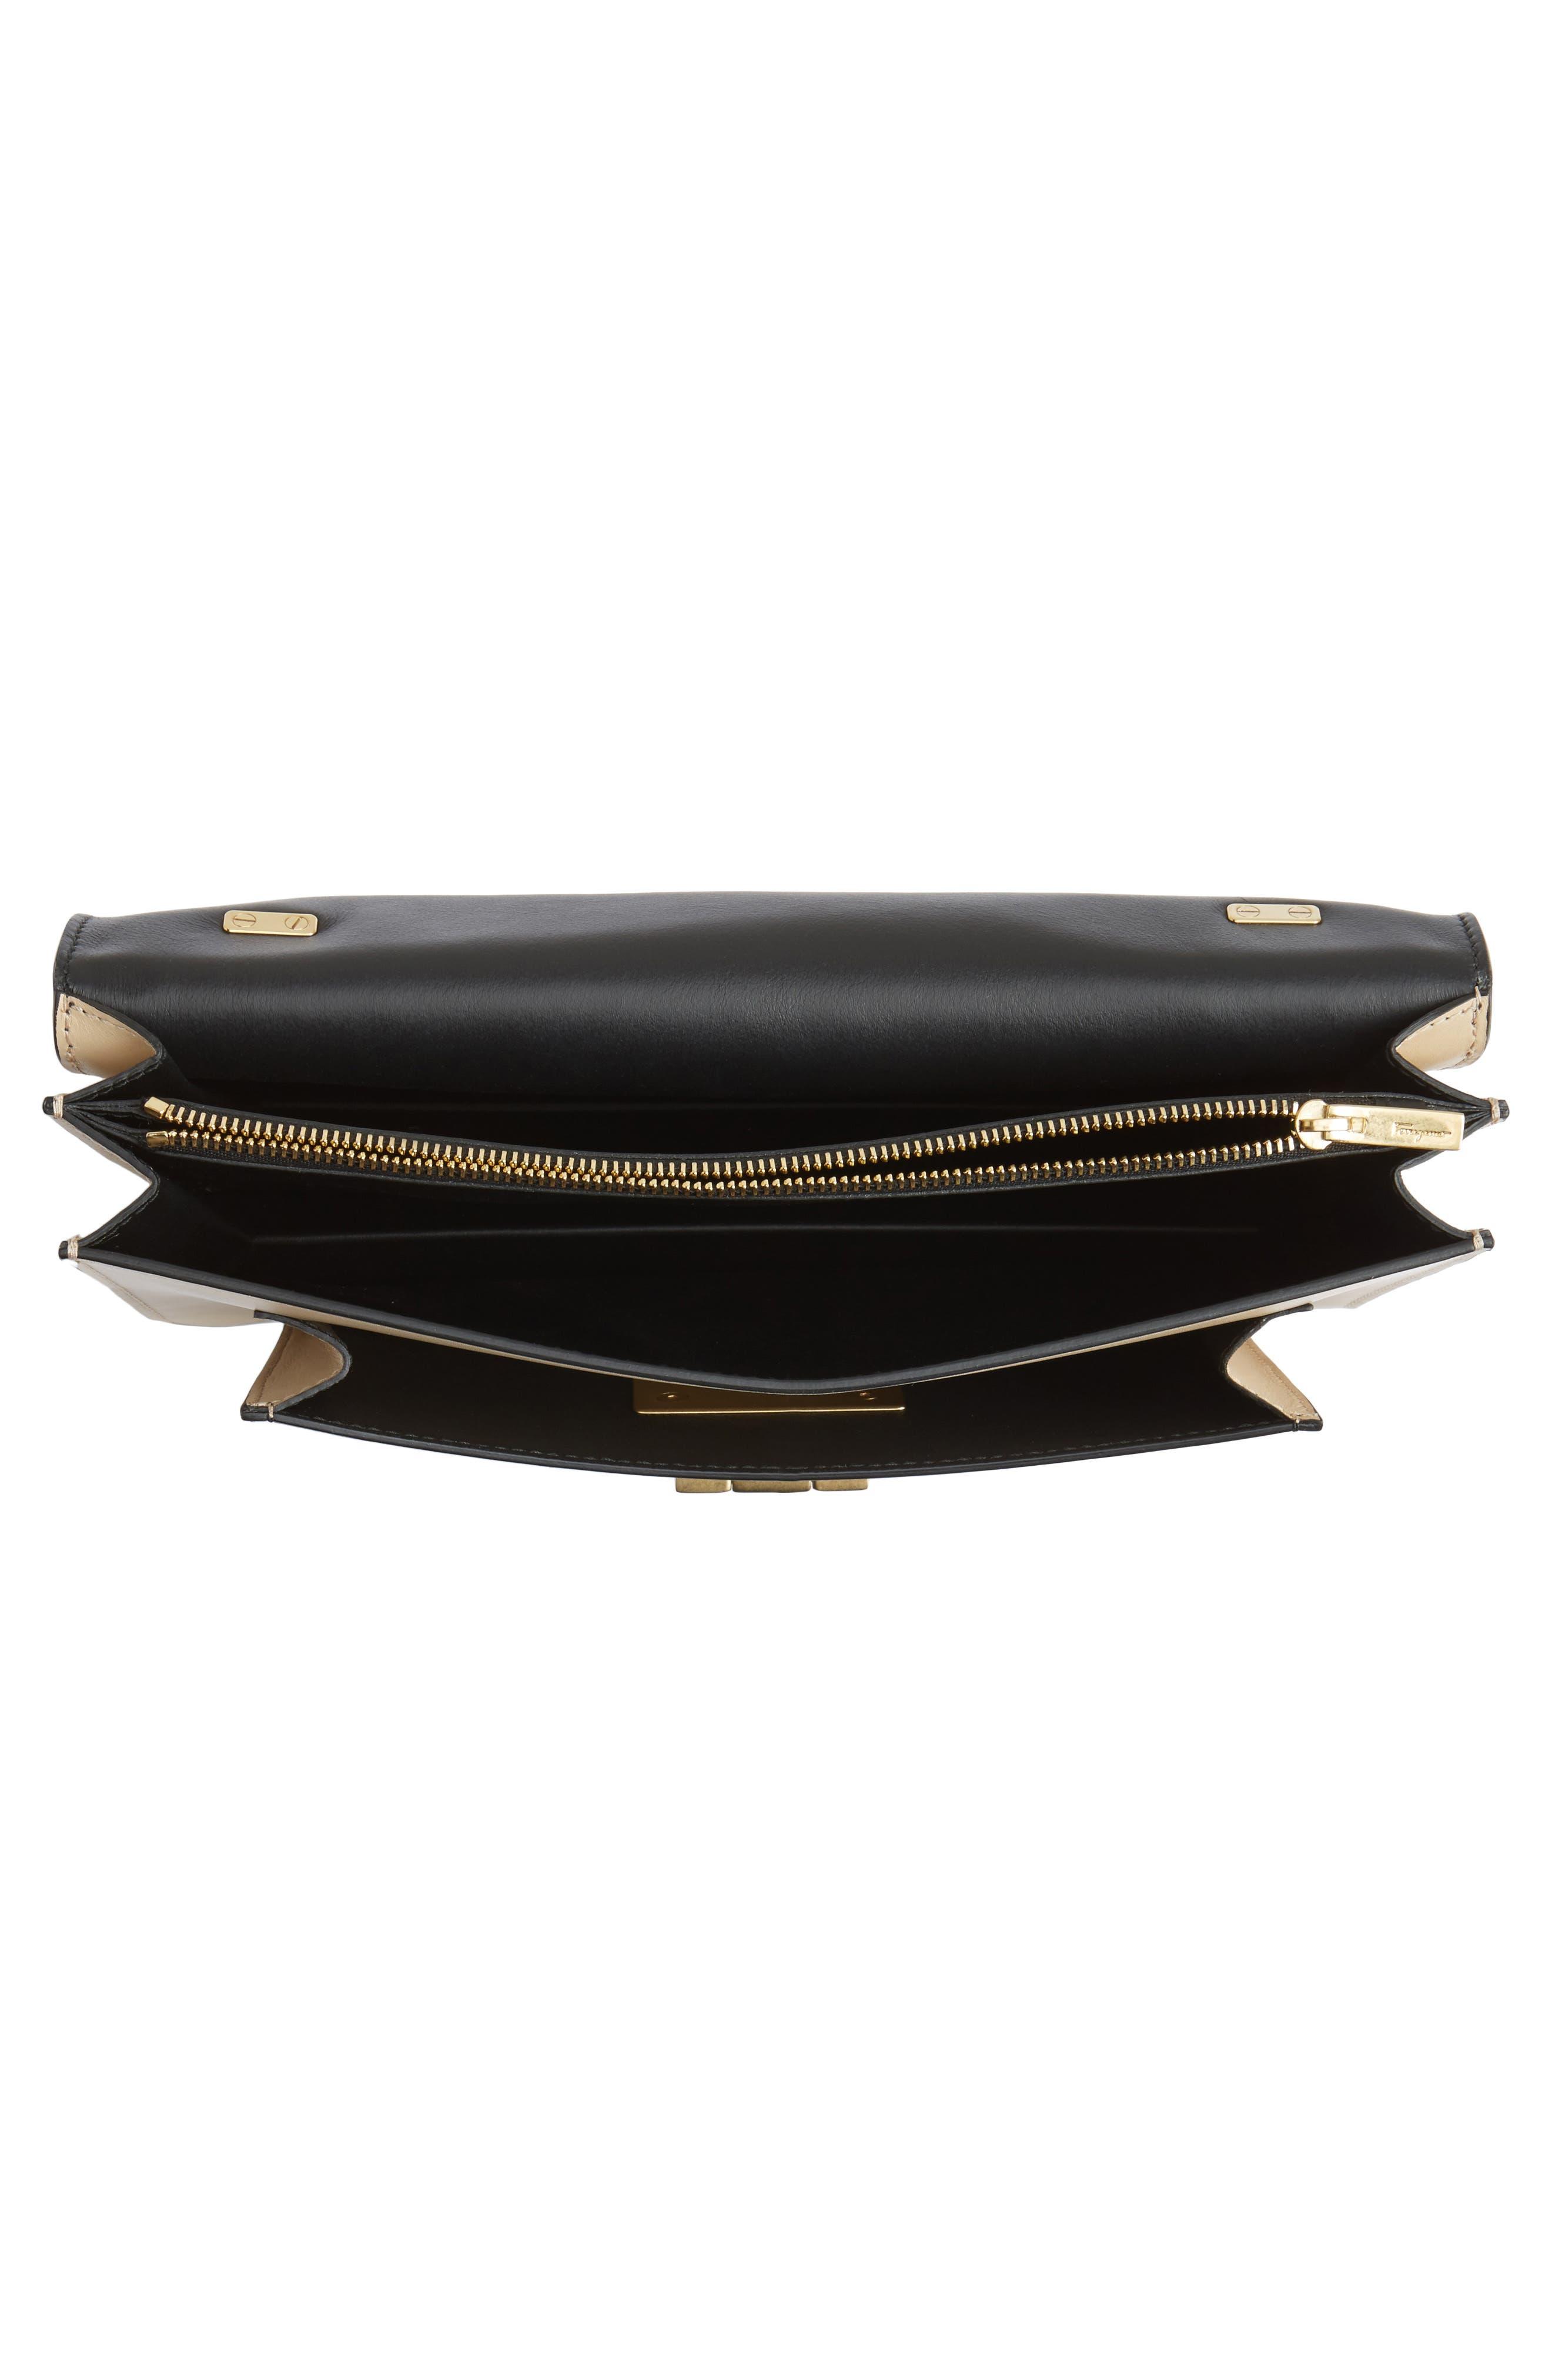 SALVATORE FERRAGAMO,                             Stingray Leather Shoulder Bag,                             Alternate thumbnail 4, color,                             974